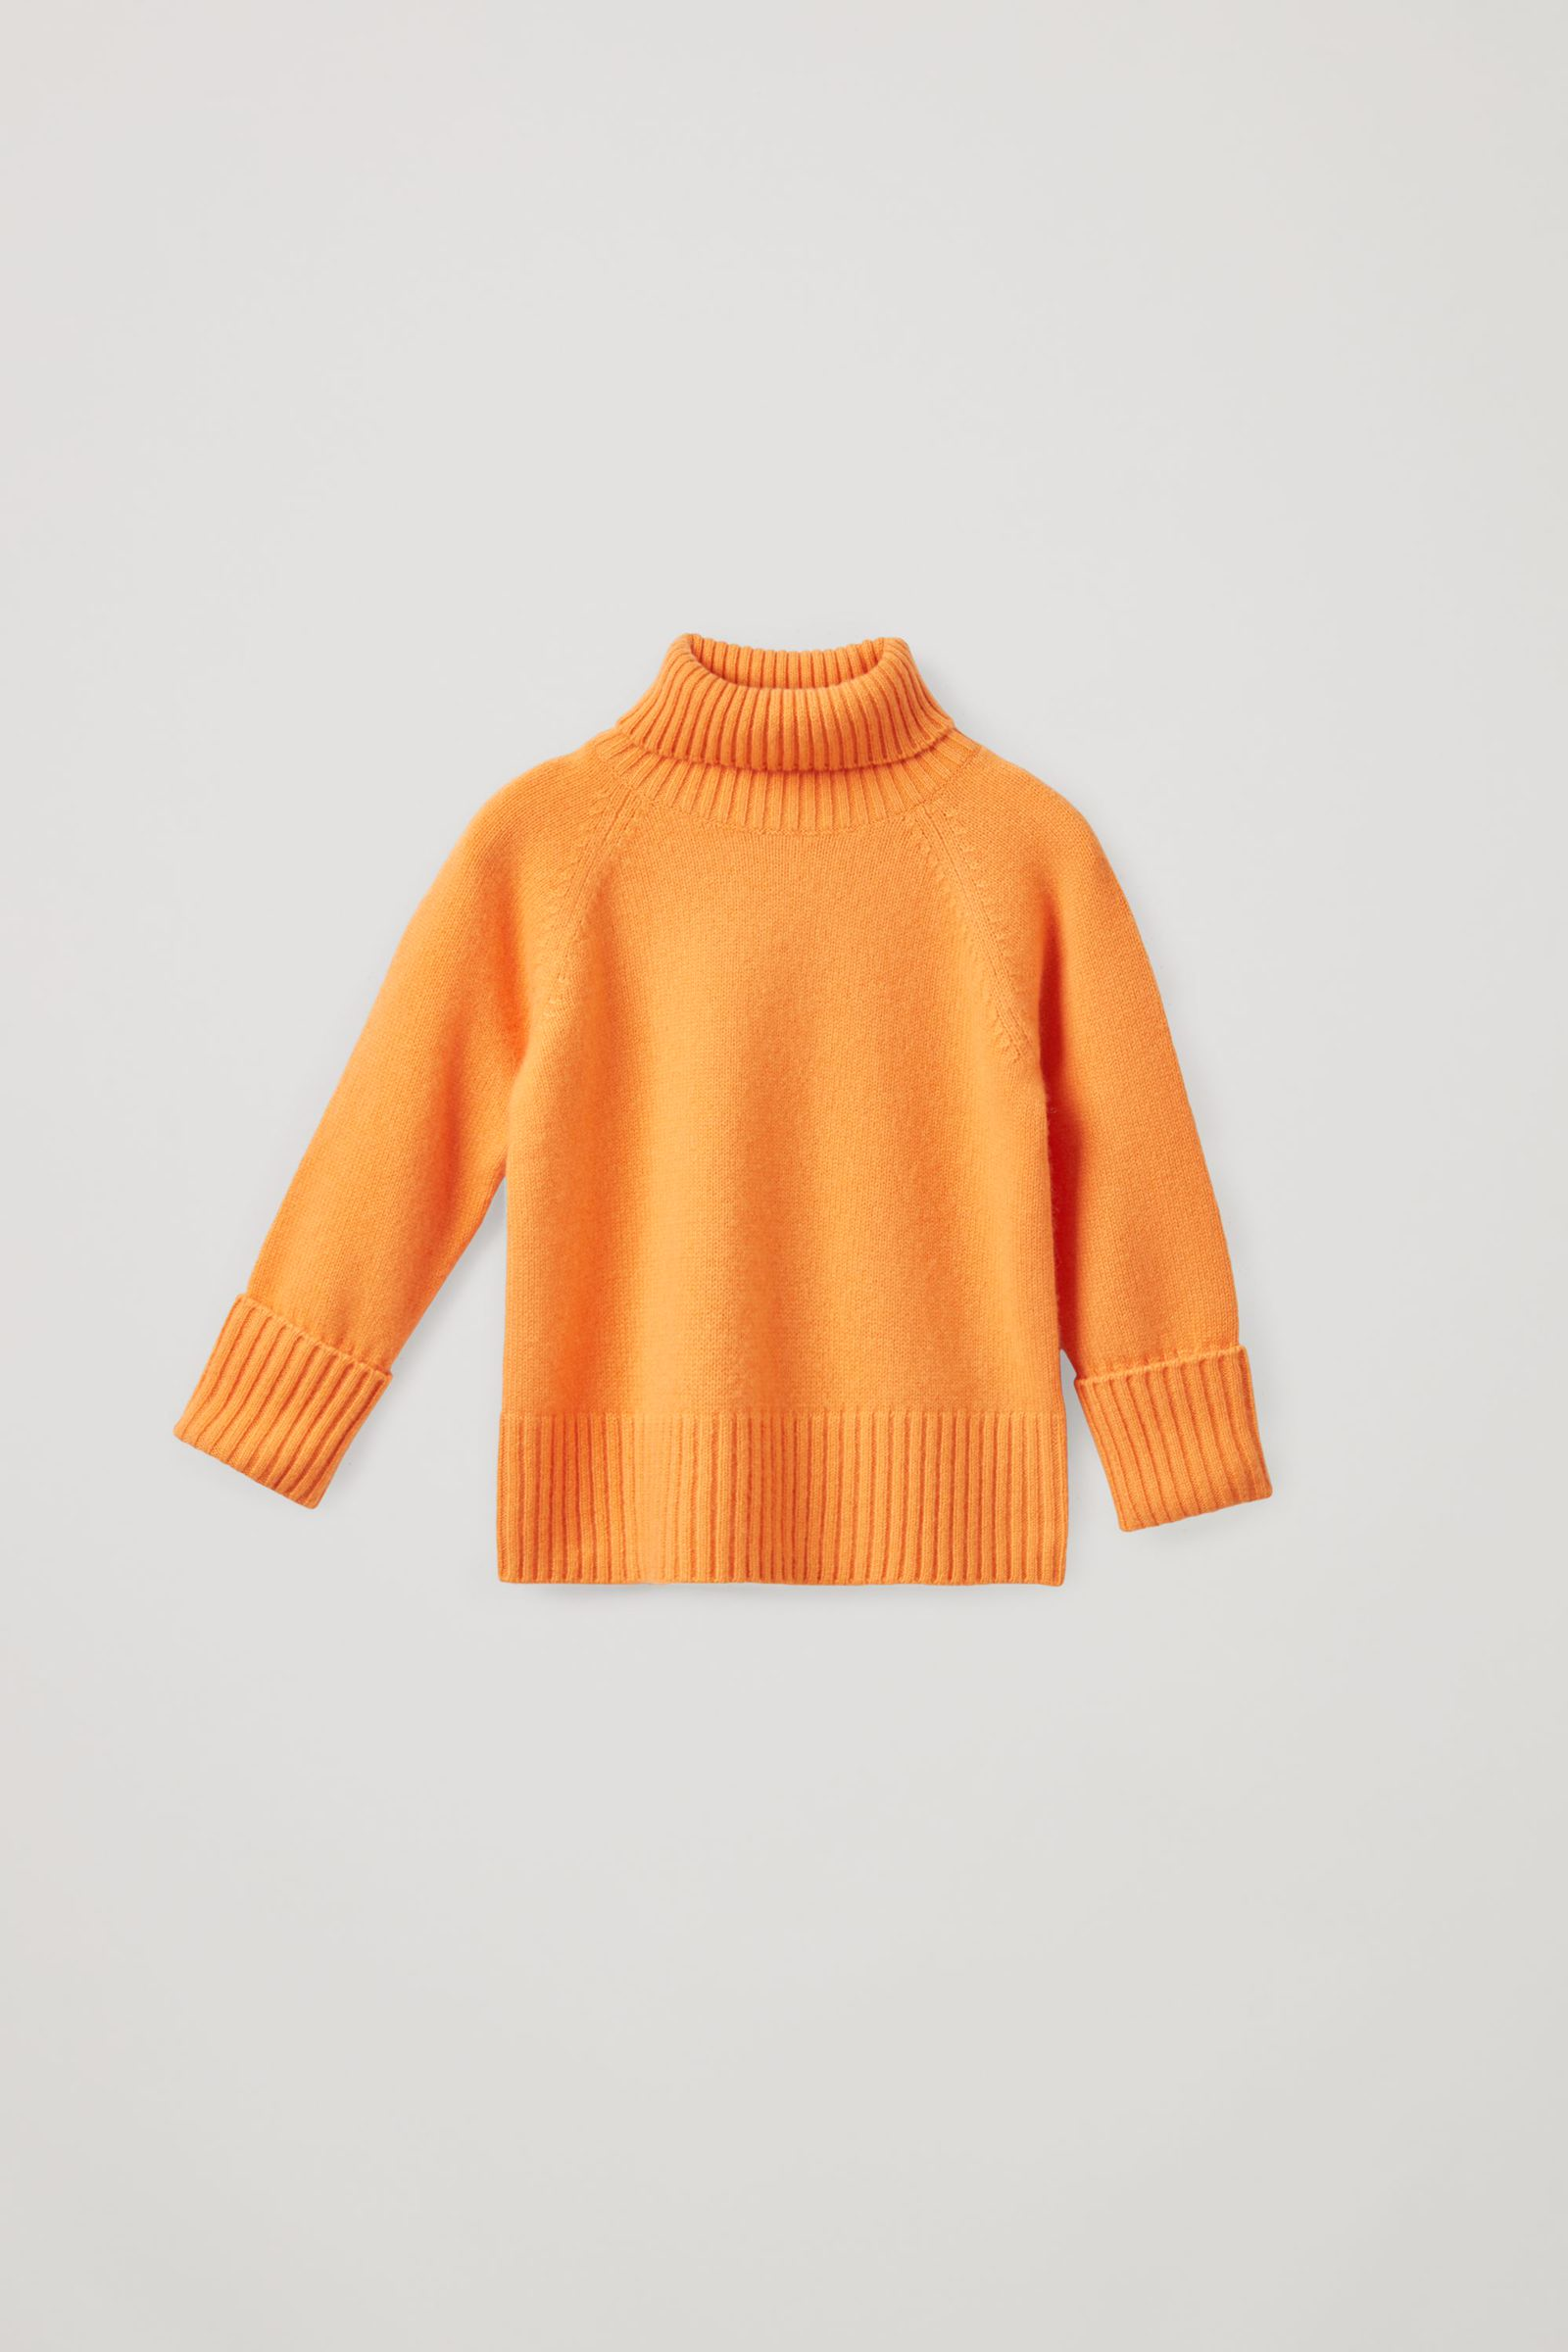 COS 롤넥 캐시미어 스웨터의 오렌지컬러 Product입니다.